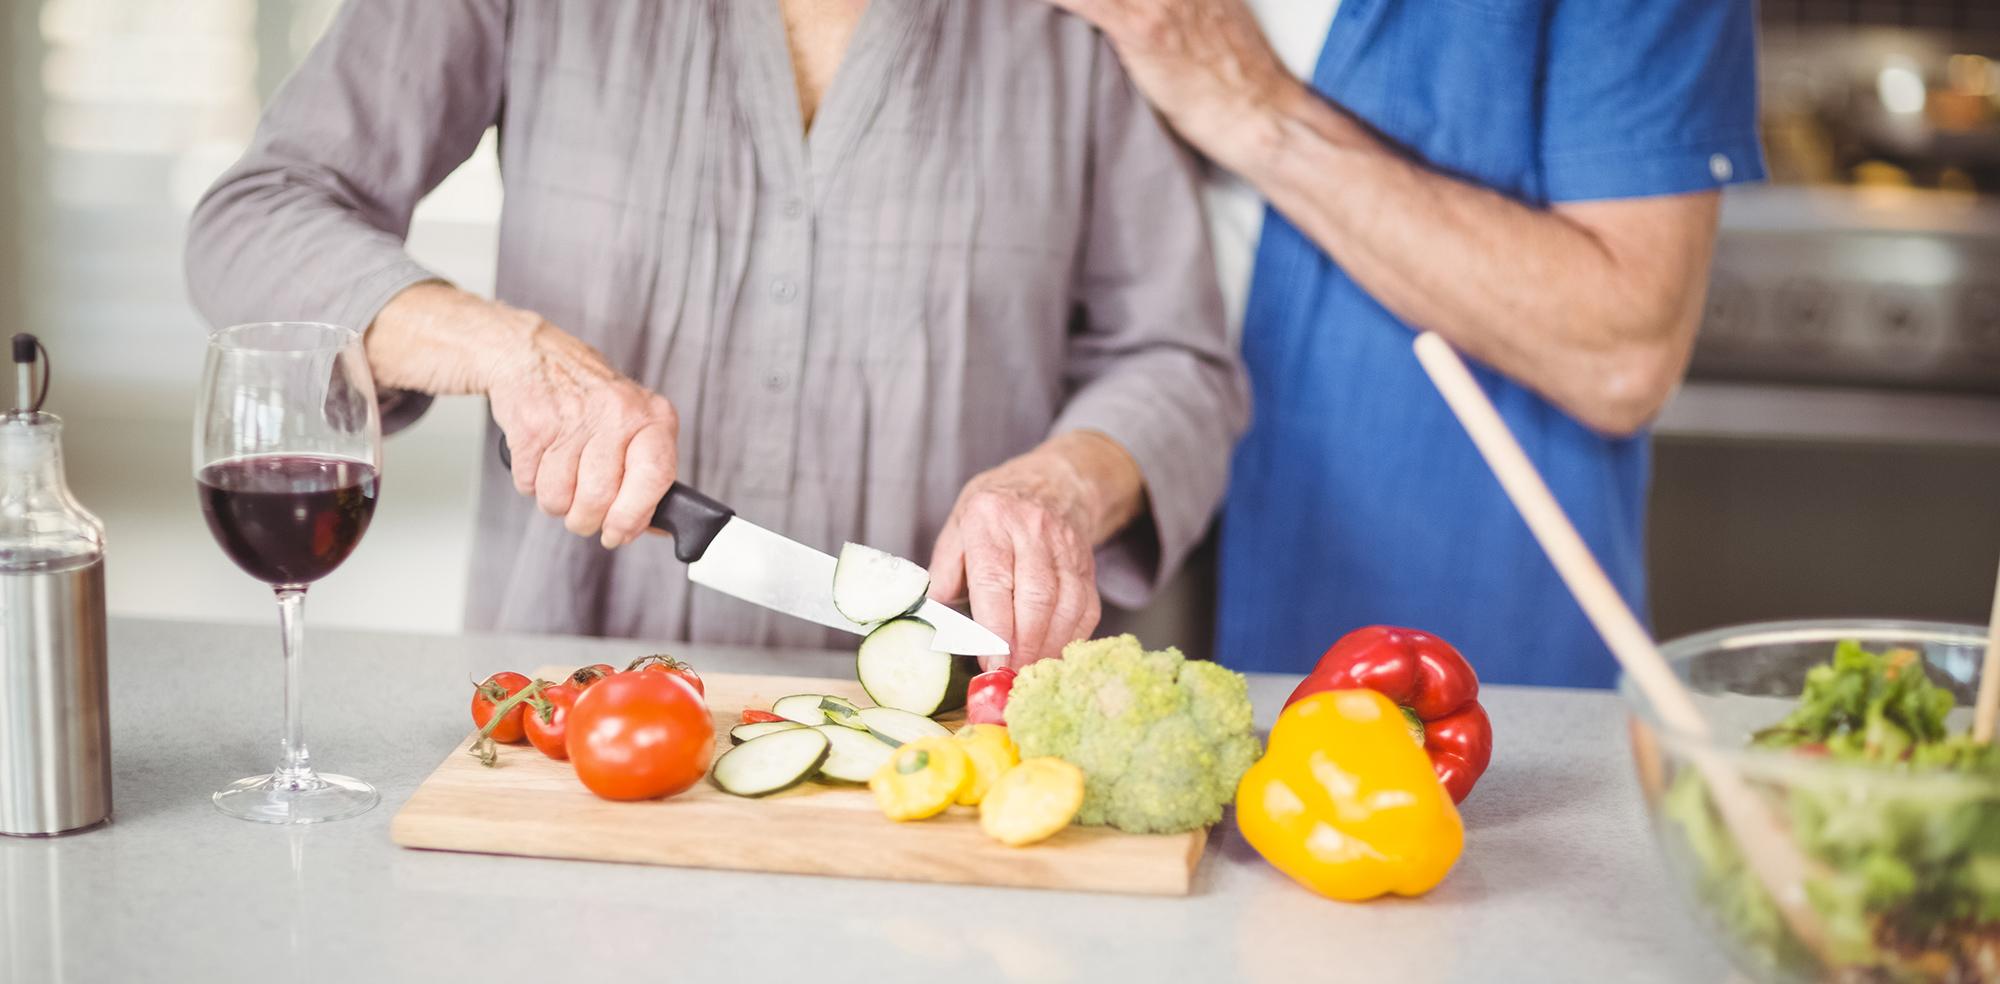 16 kitchen tricks foodies will love